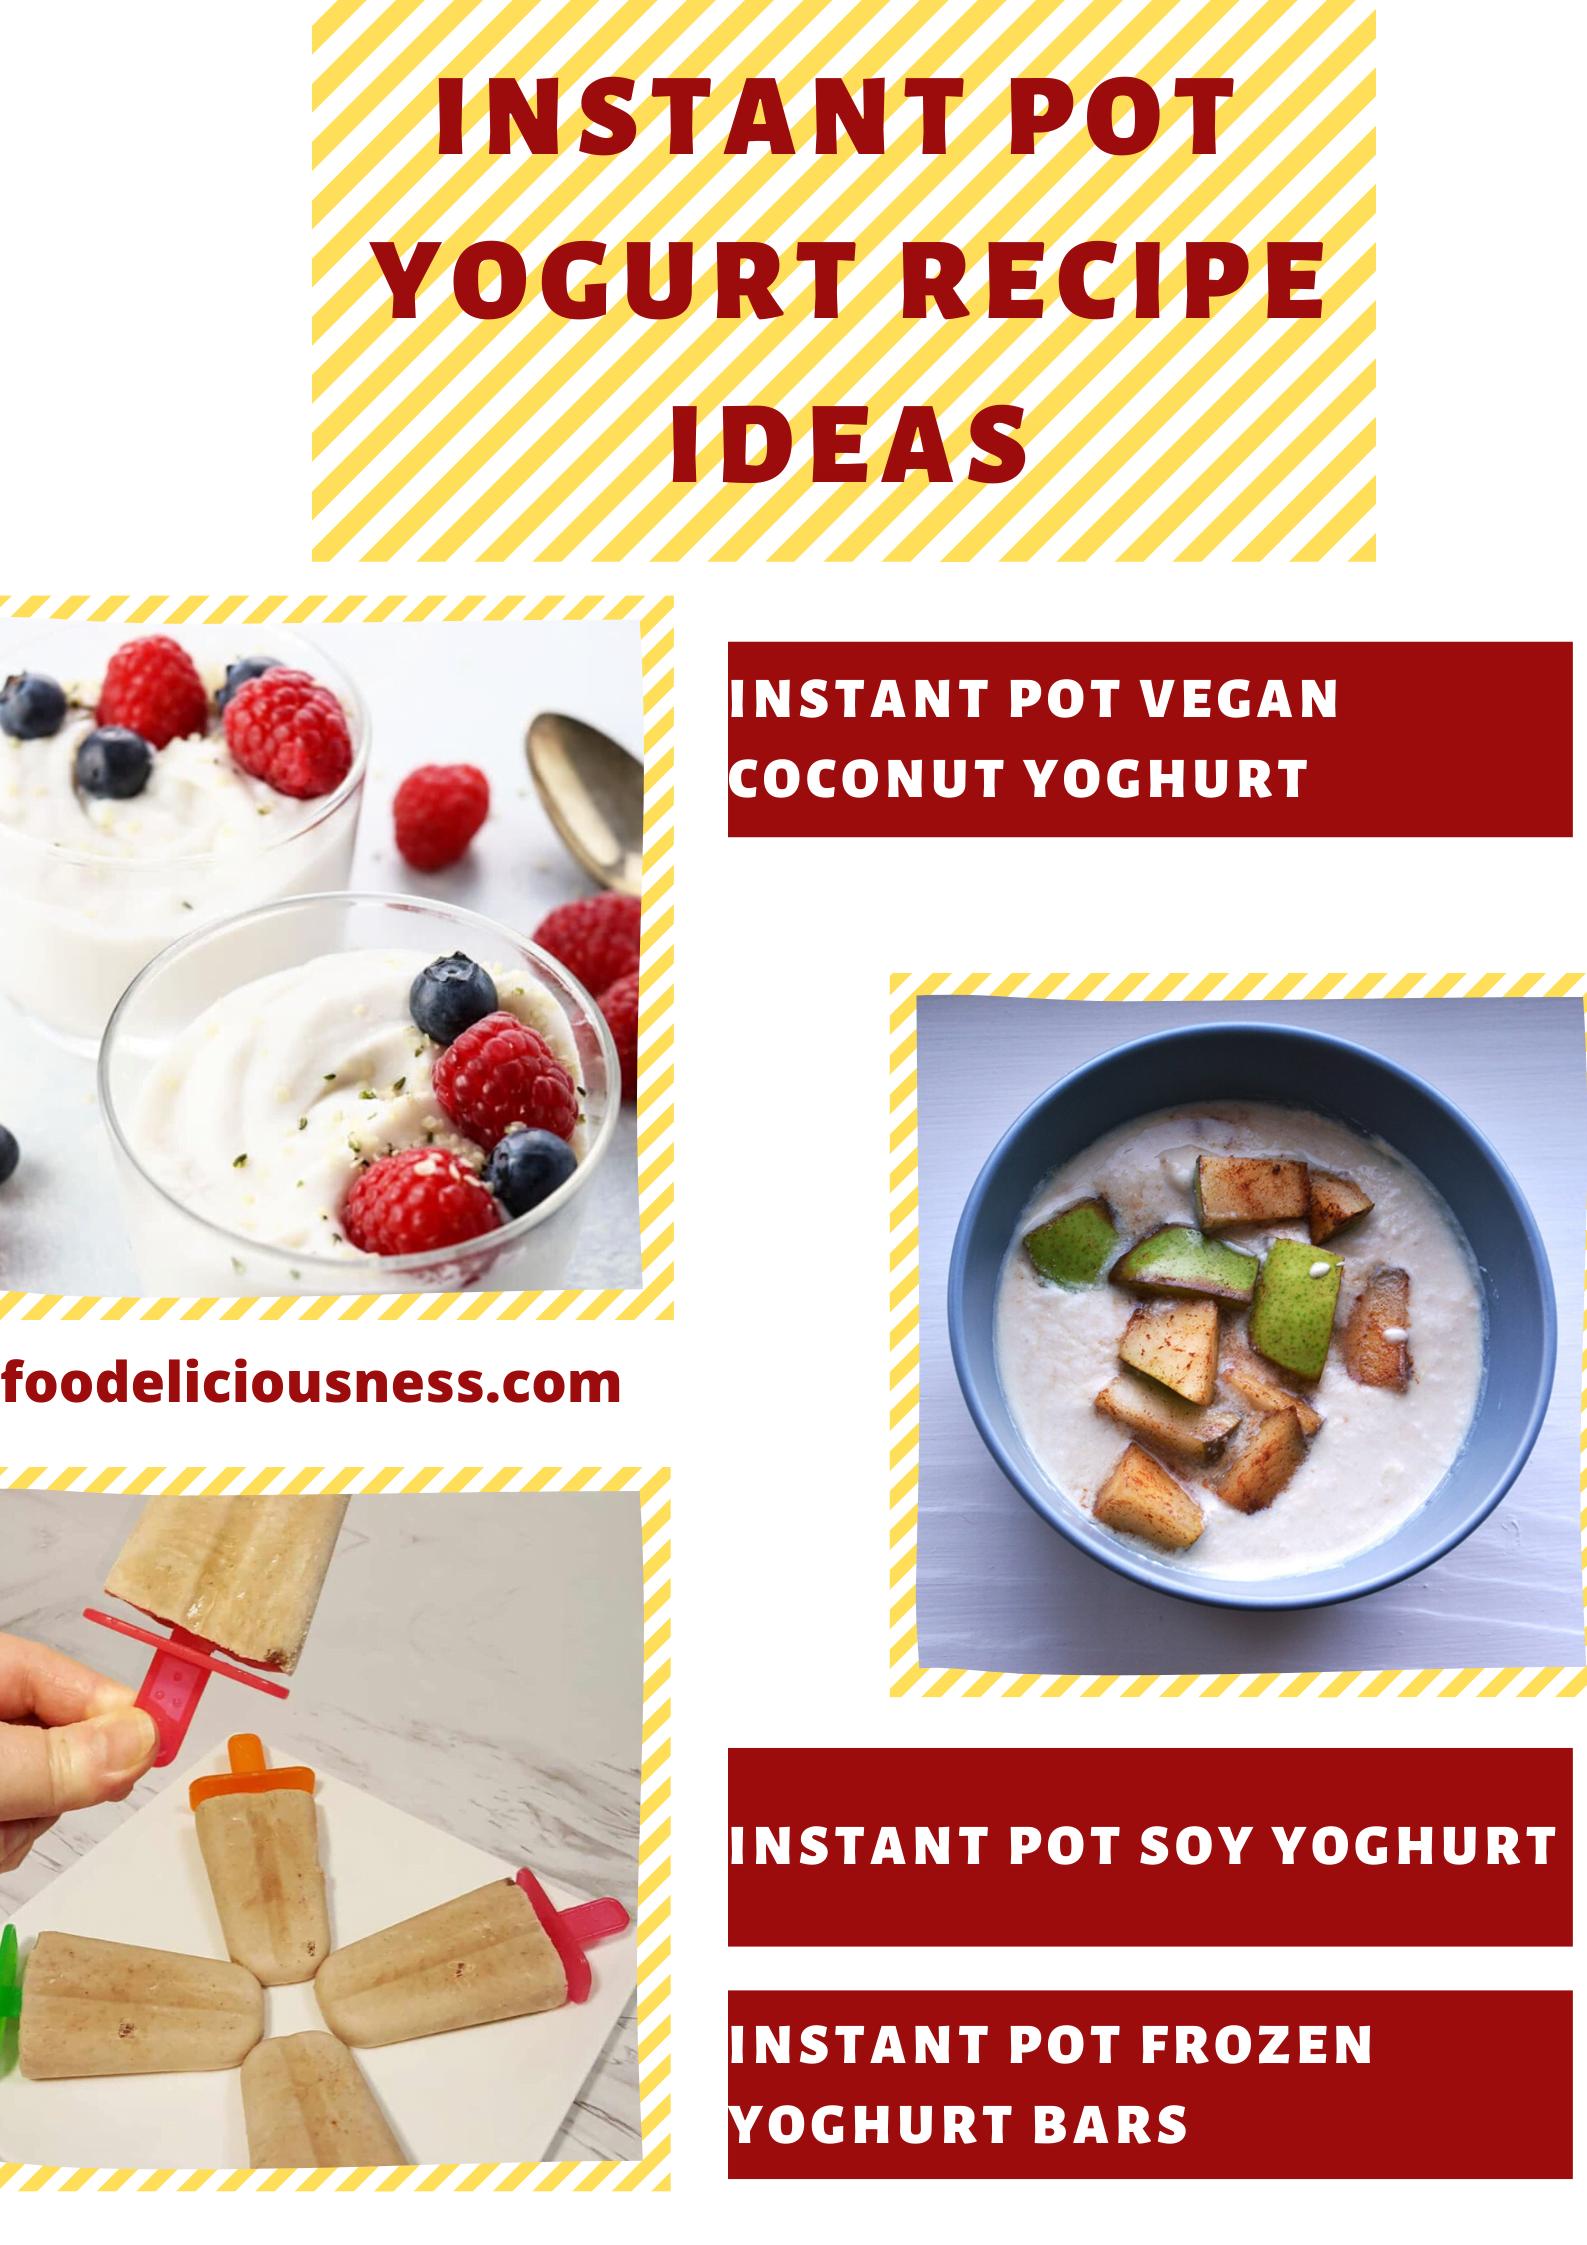 instant pot yogurt recipe ideas 3